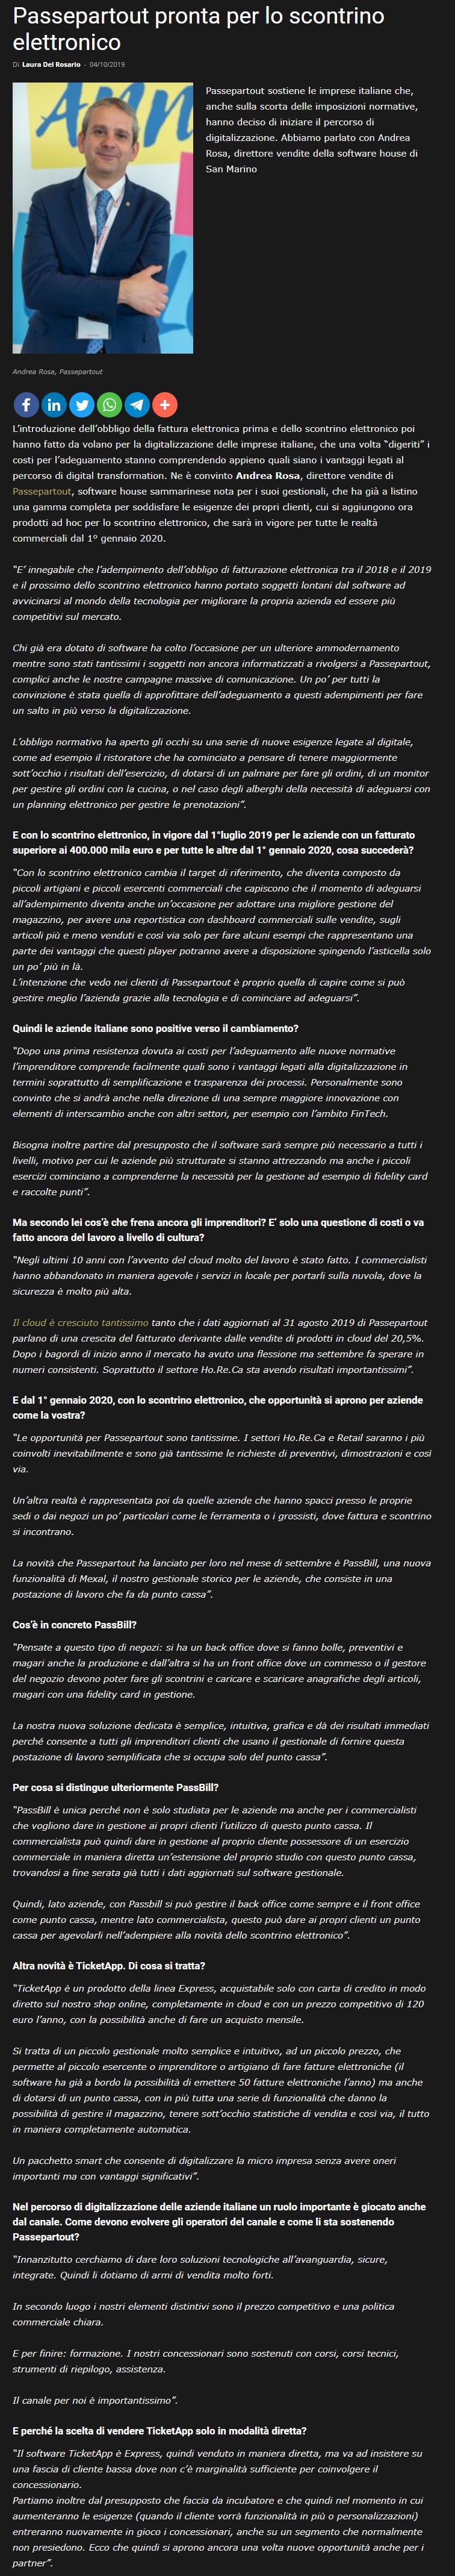 Datamanager_Fiumana_Ago2019